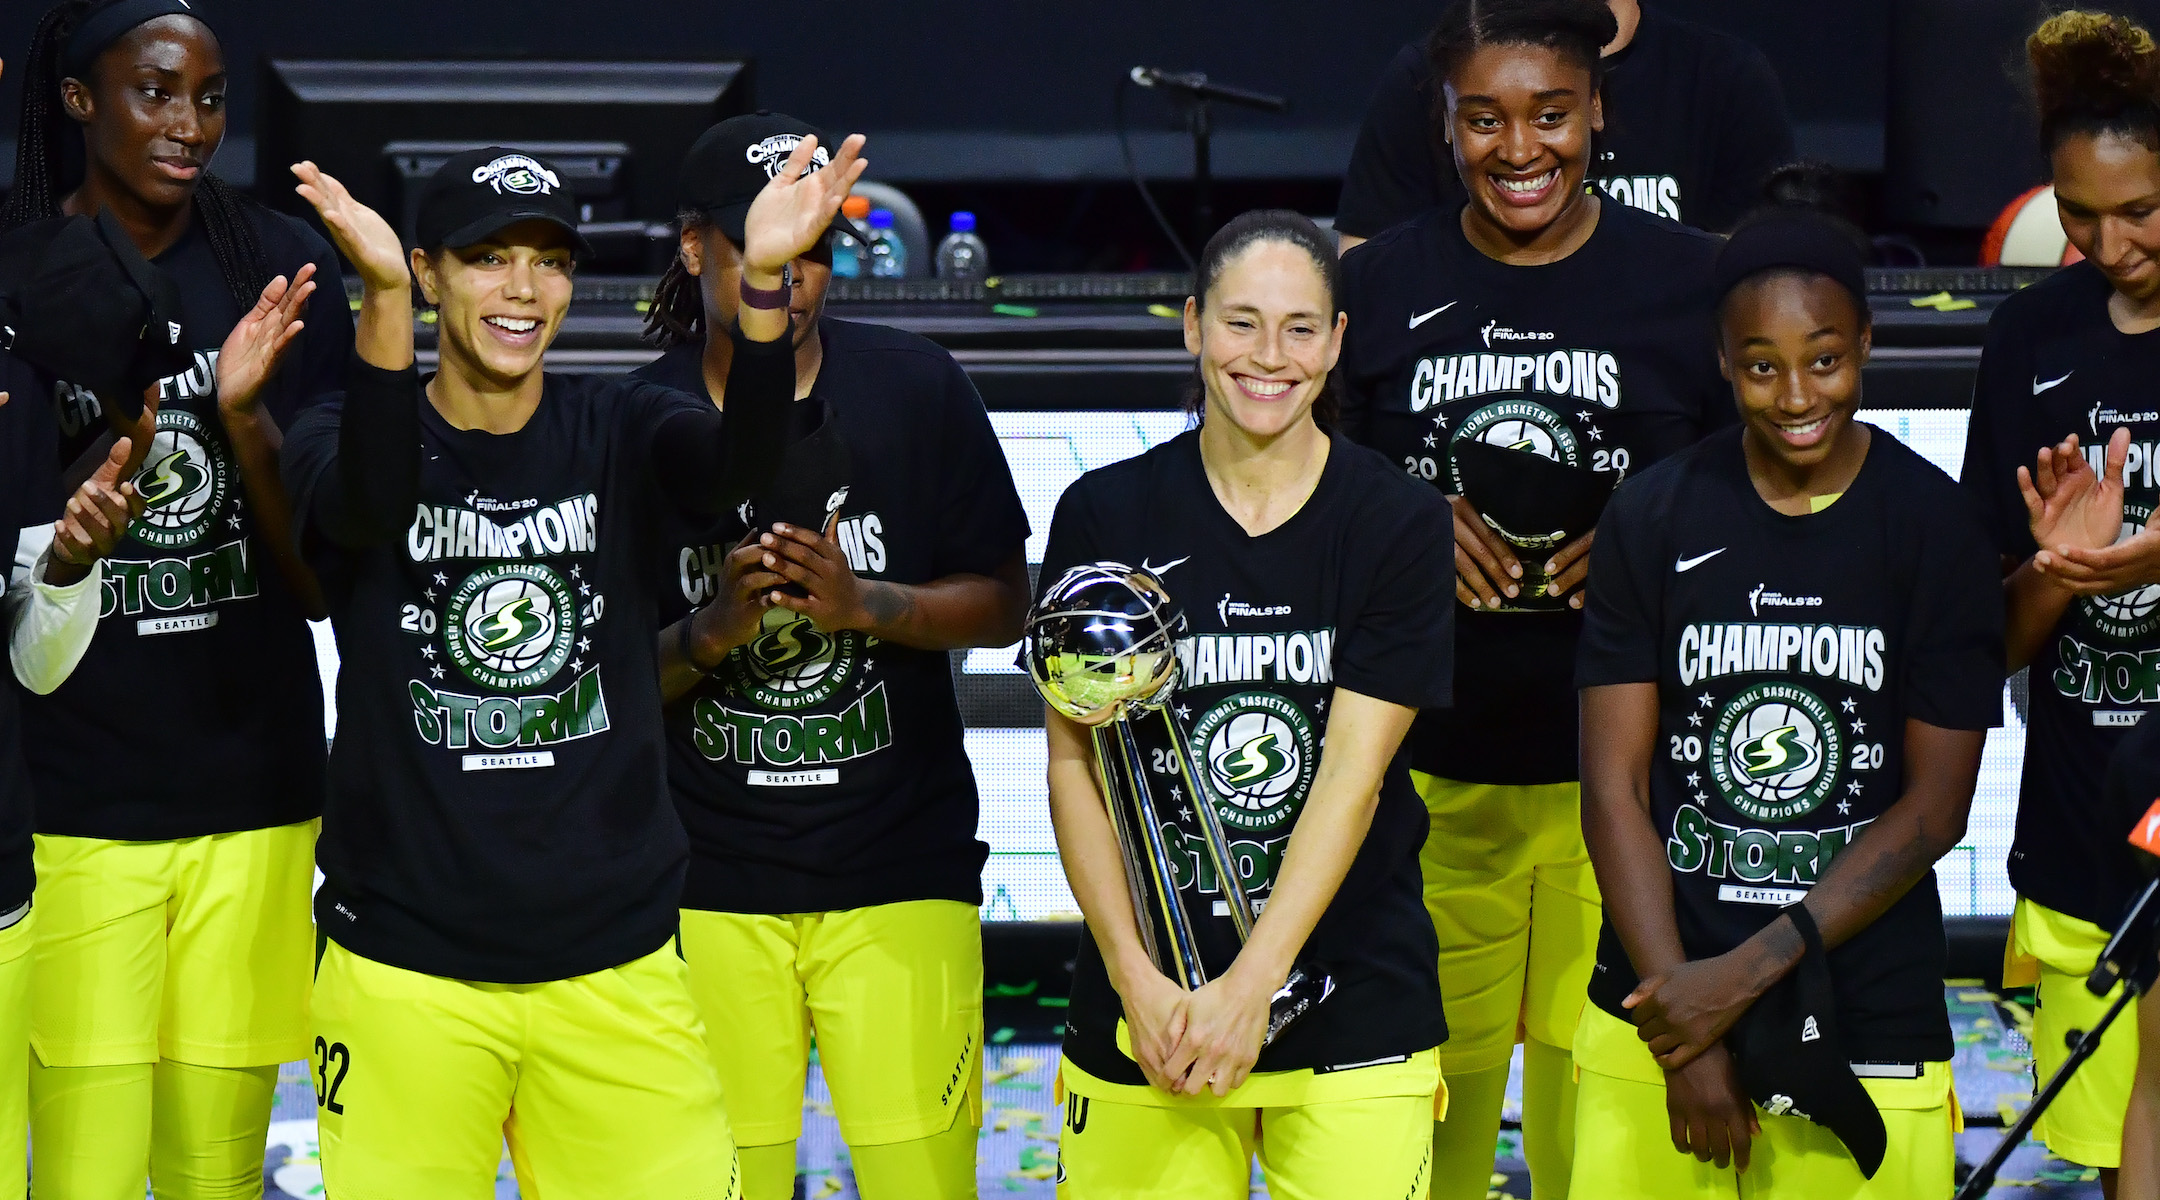 2 Jewish stars helped power the Seattle Storm to a WNBA championship - Jewish Telegraphic Agency